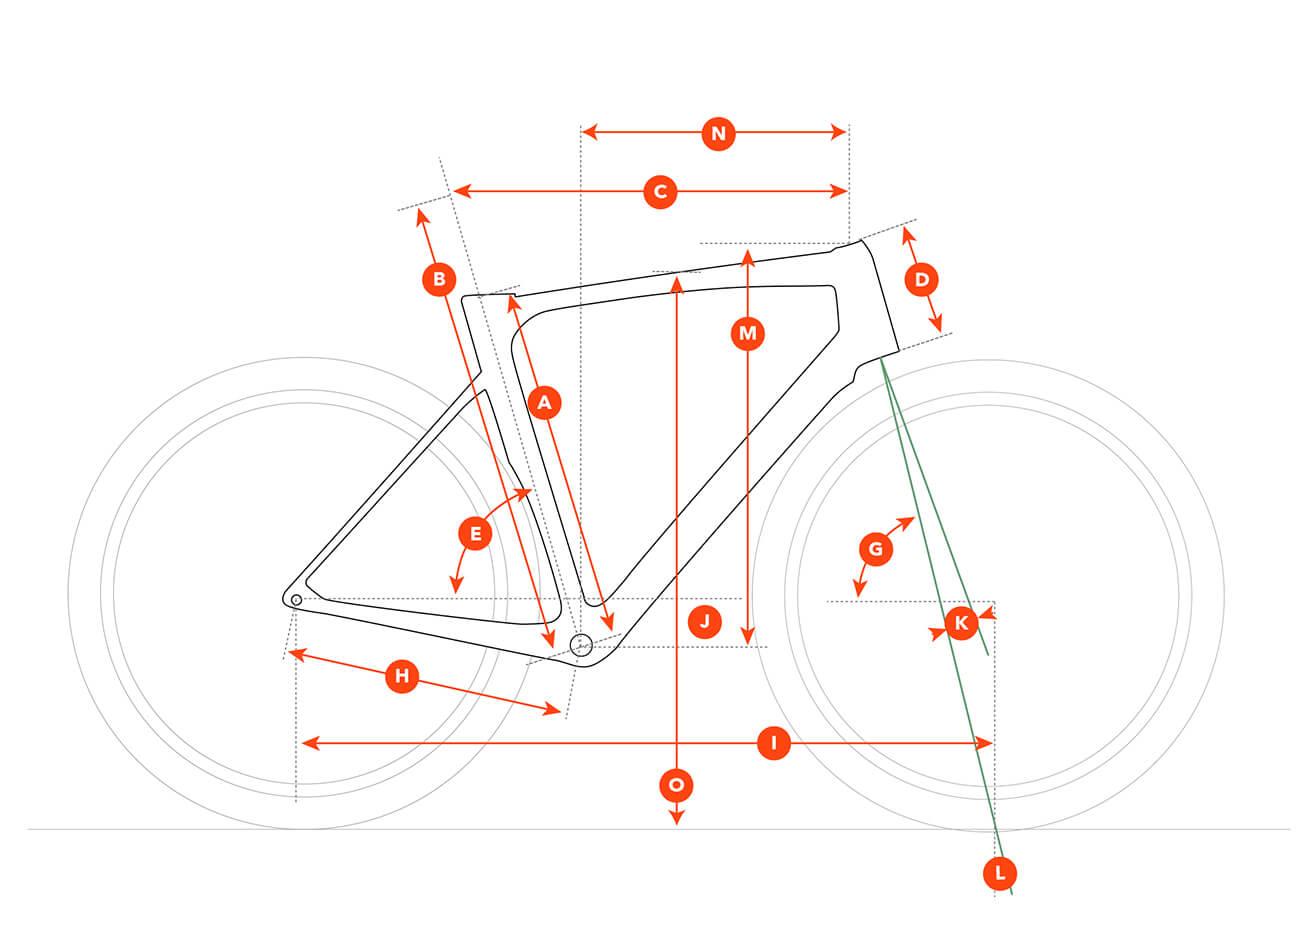 rt-1100-geo.jpg diagram